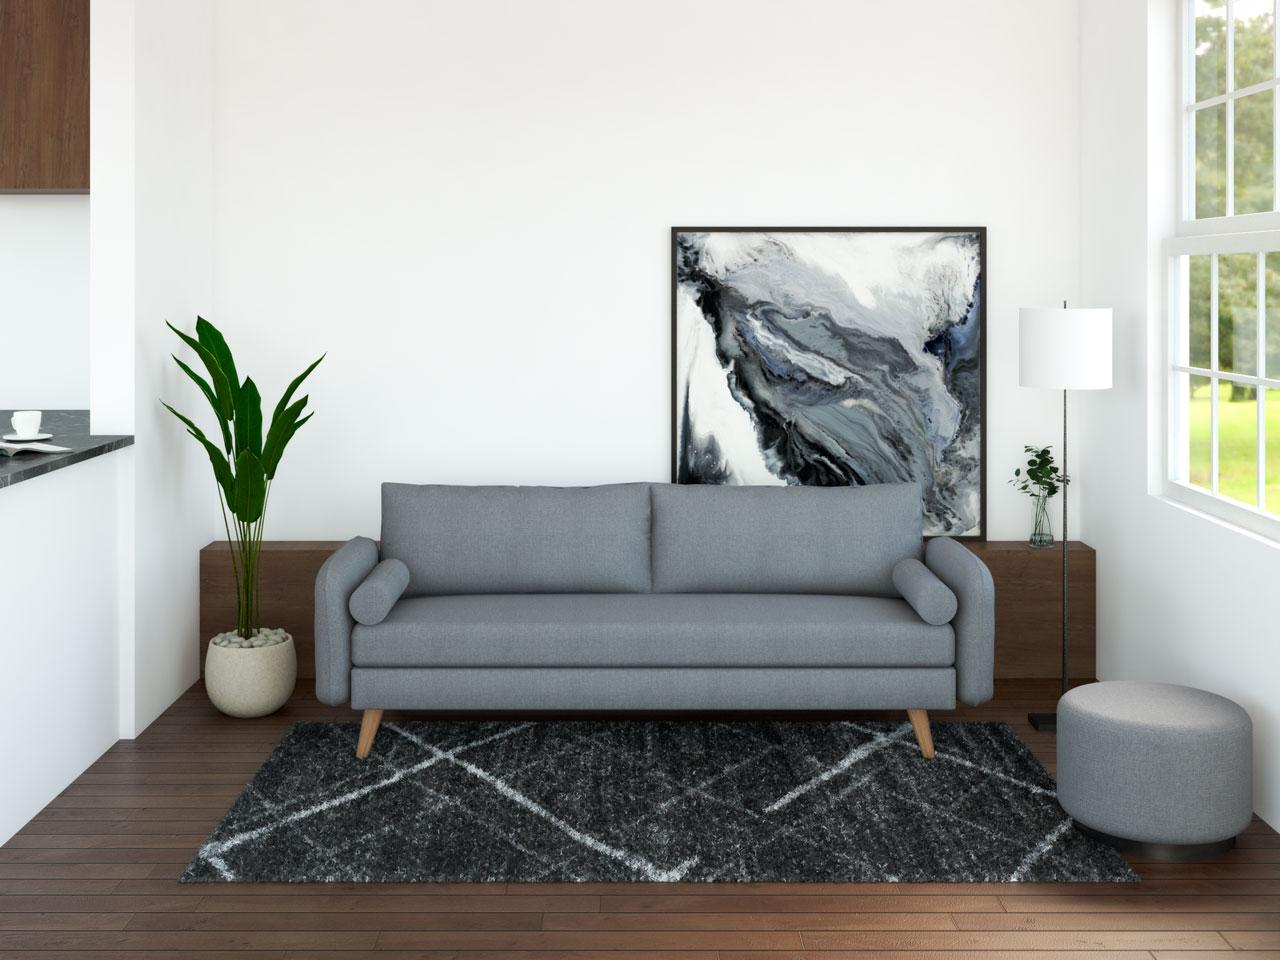 Dark gray furniture with dark hardwood flooring